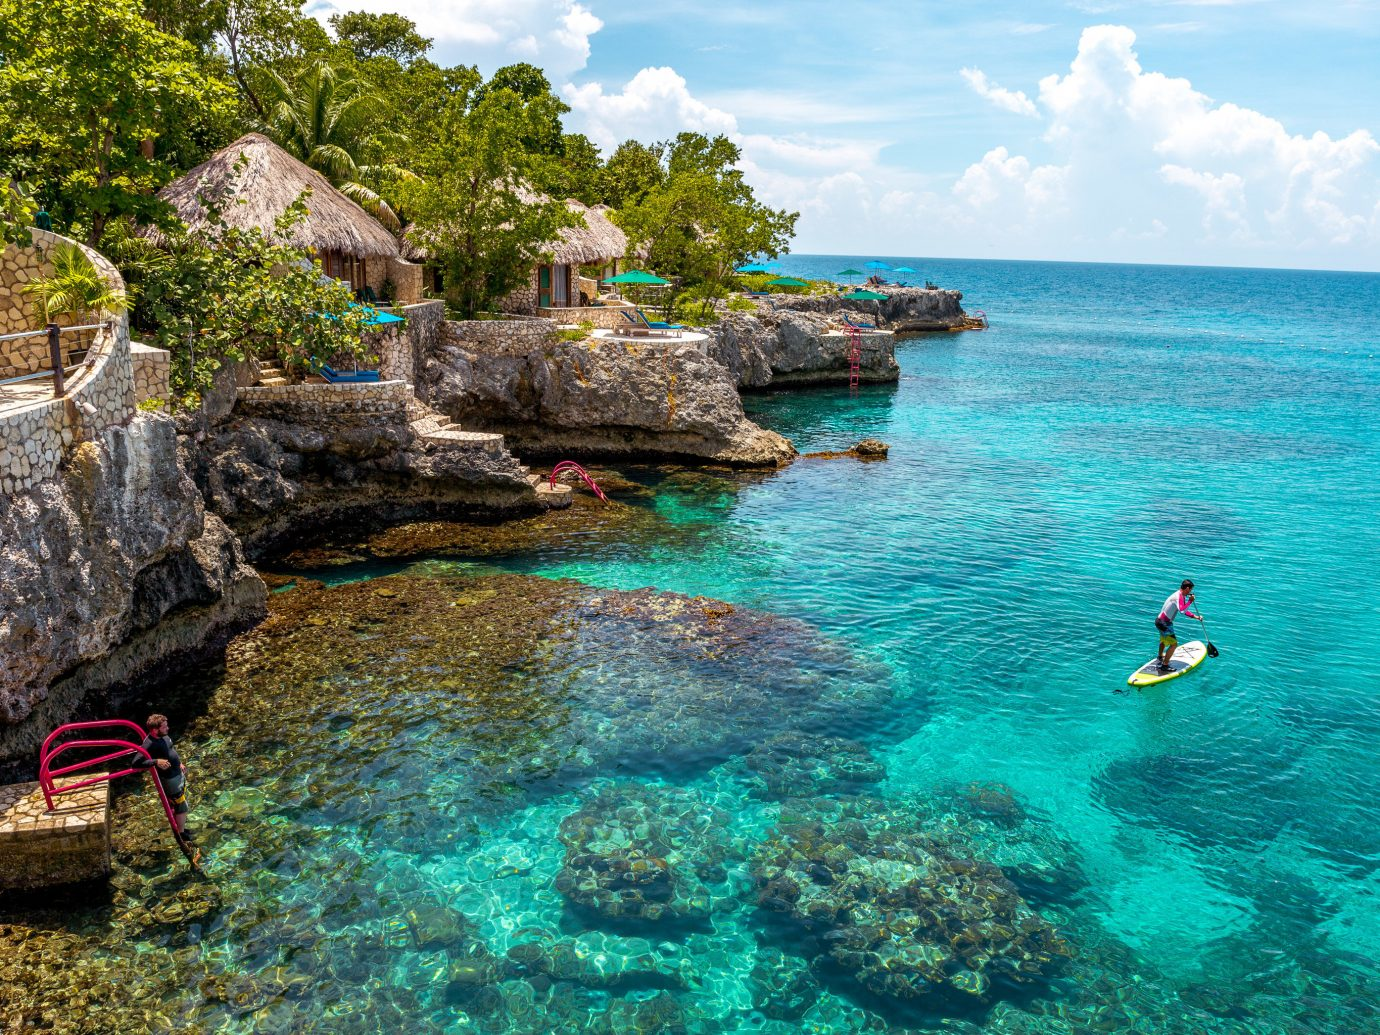 Budget Hotels Trip Ideas water sky outdoor rock landform Sea body of water Nature vacation Ocean Coast bay tropics Lagoon terrain Island